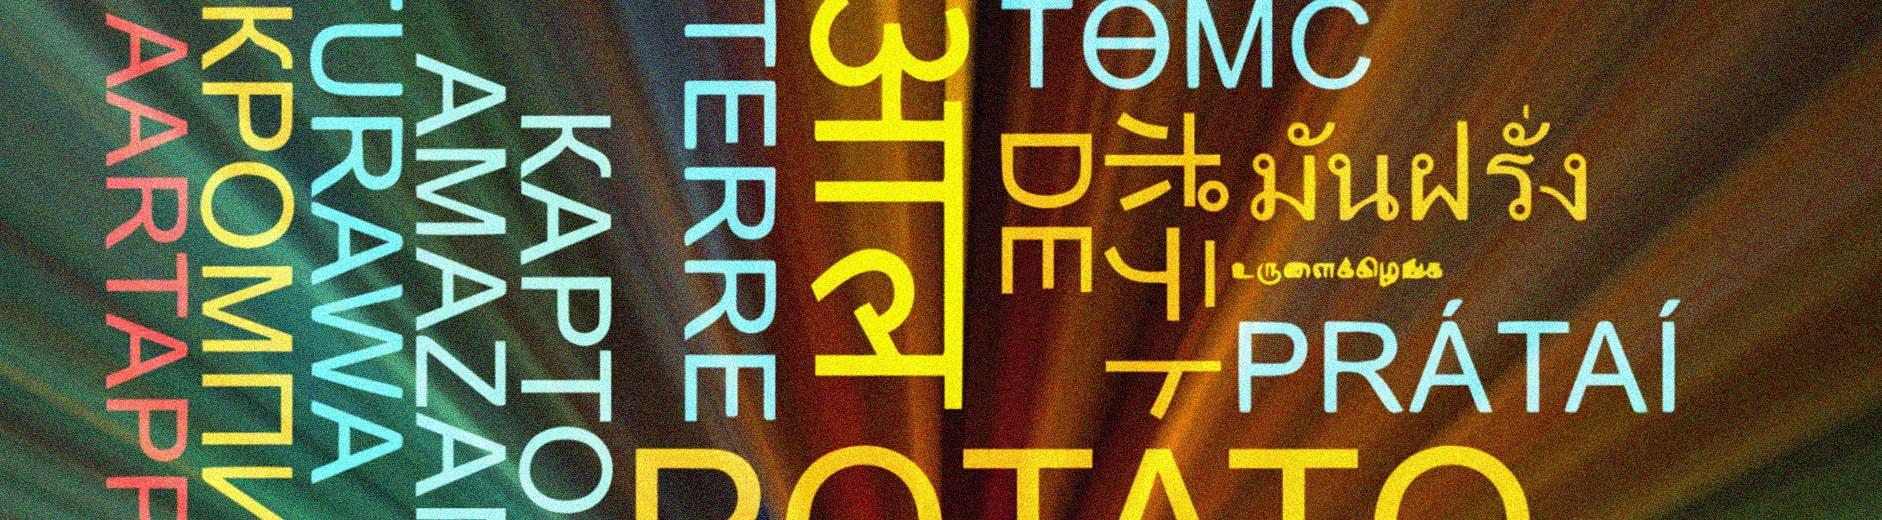 blog main banner